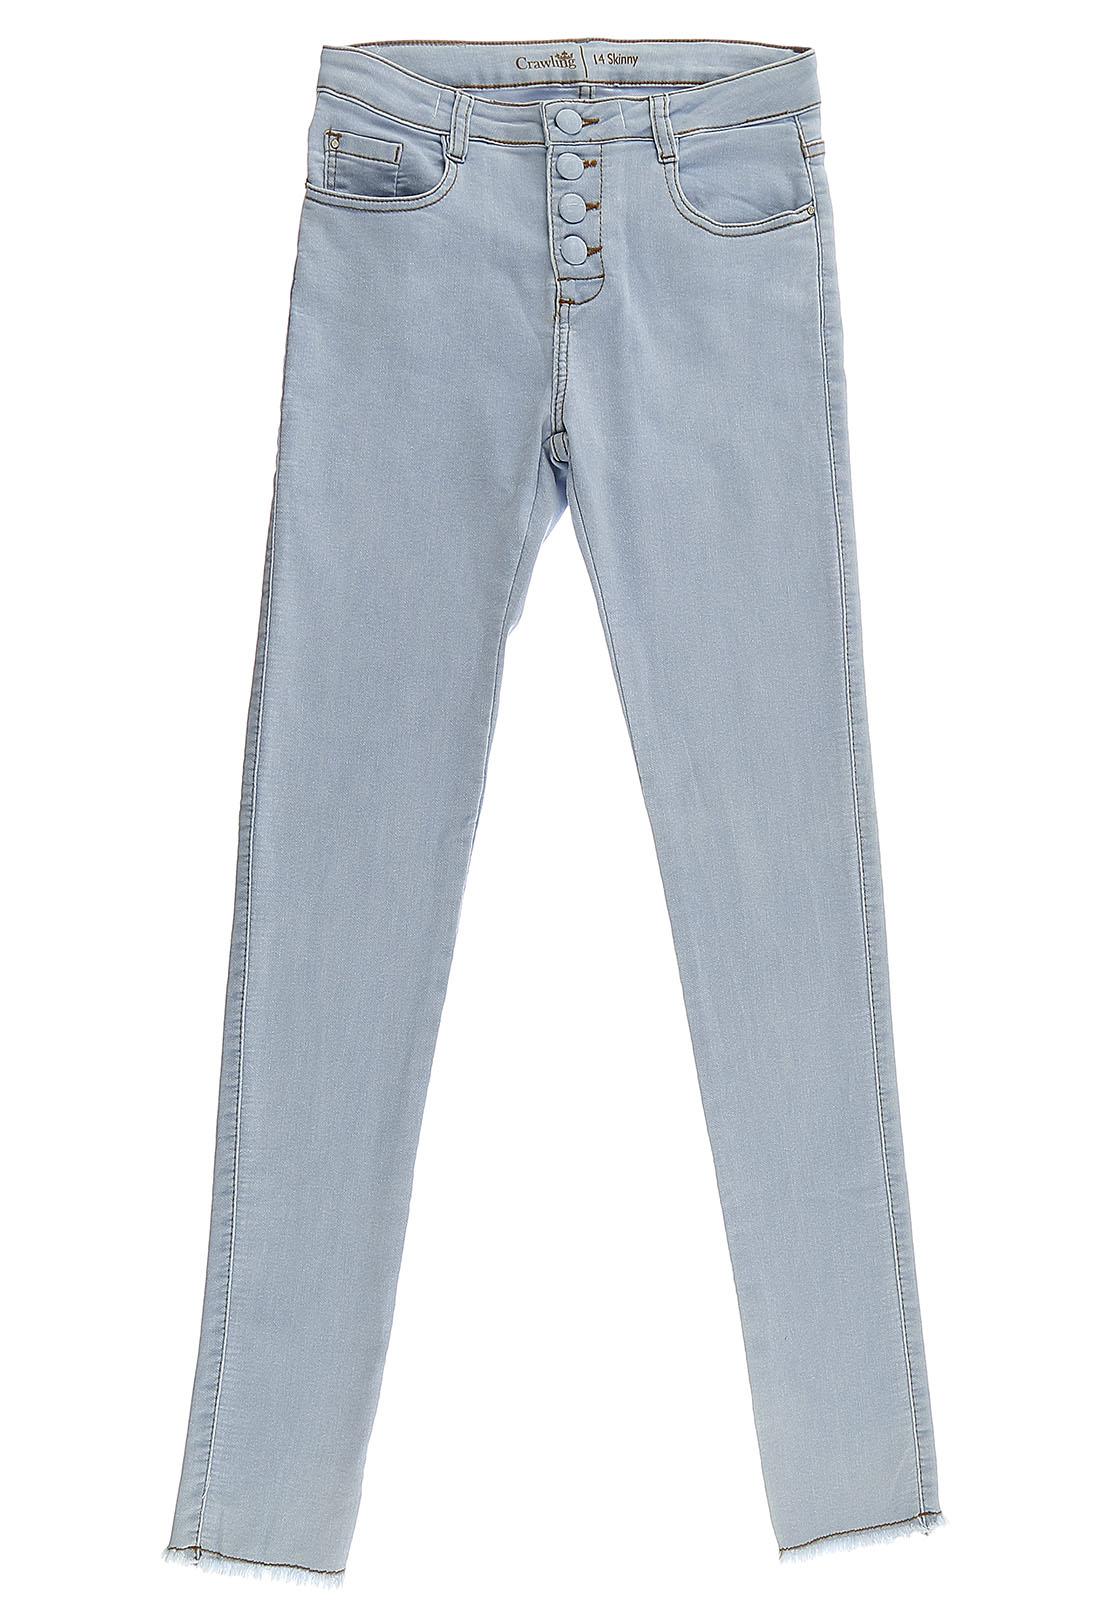 Calça Skinny Feminina Crawling Jeans